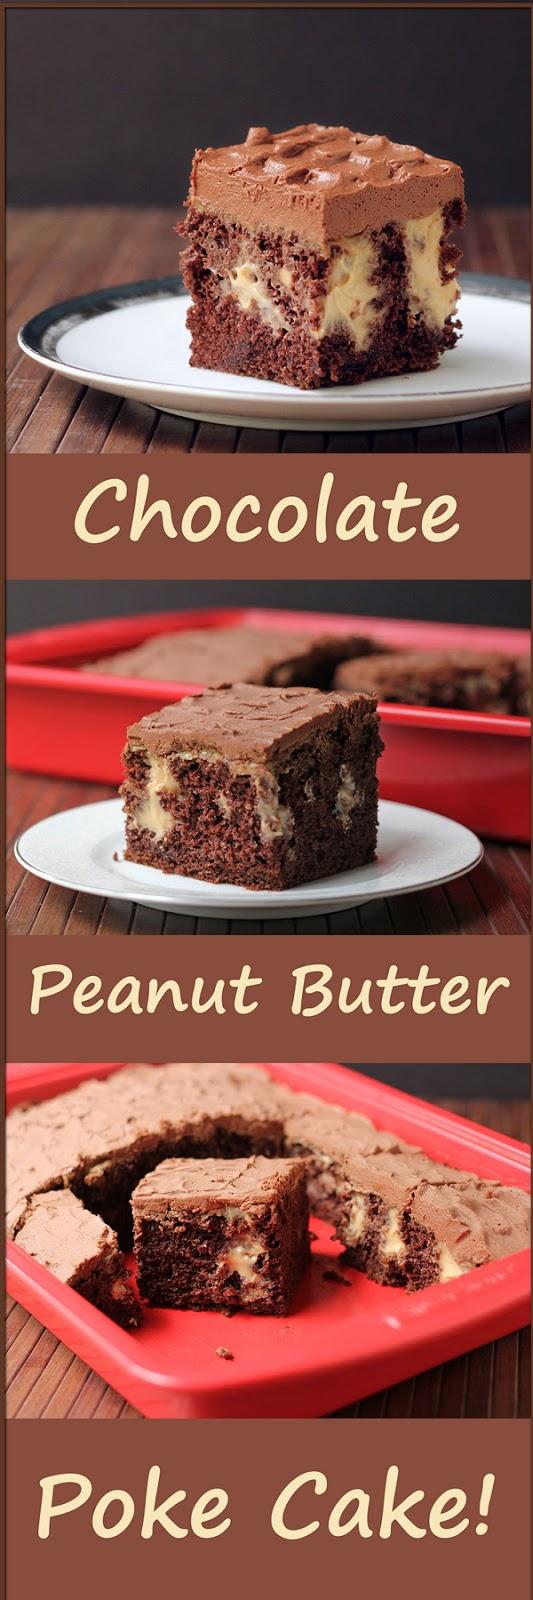 Chocolate and Peanut Butter Pudding Poke Cake